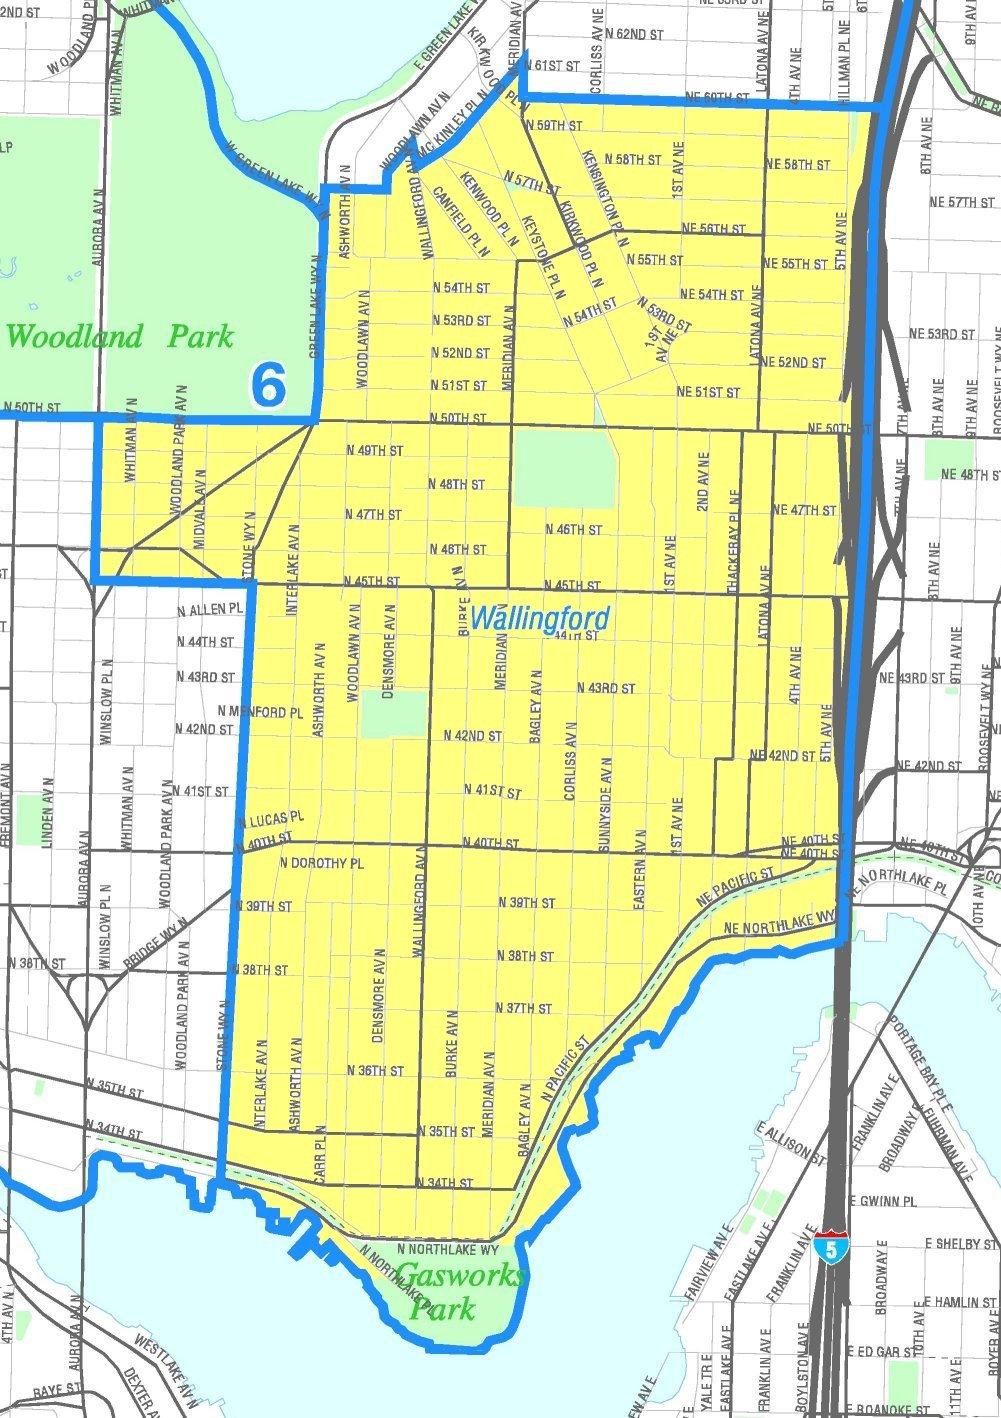 seattle neighborhood guide map bnhspinecom